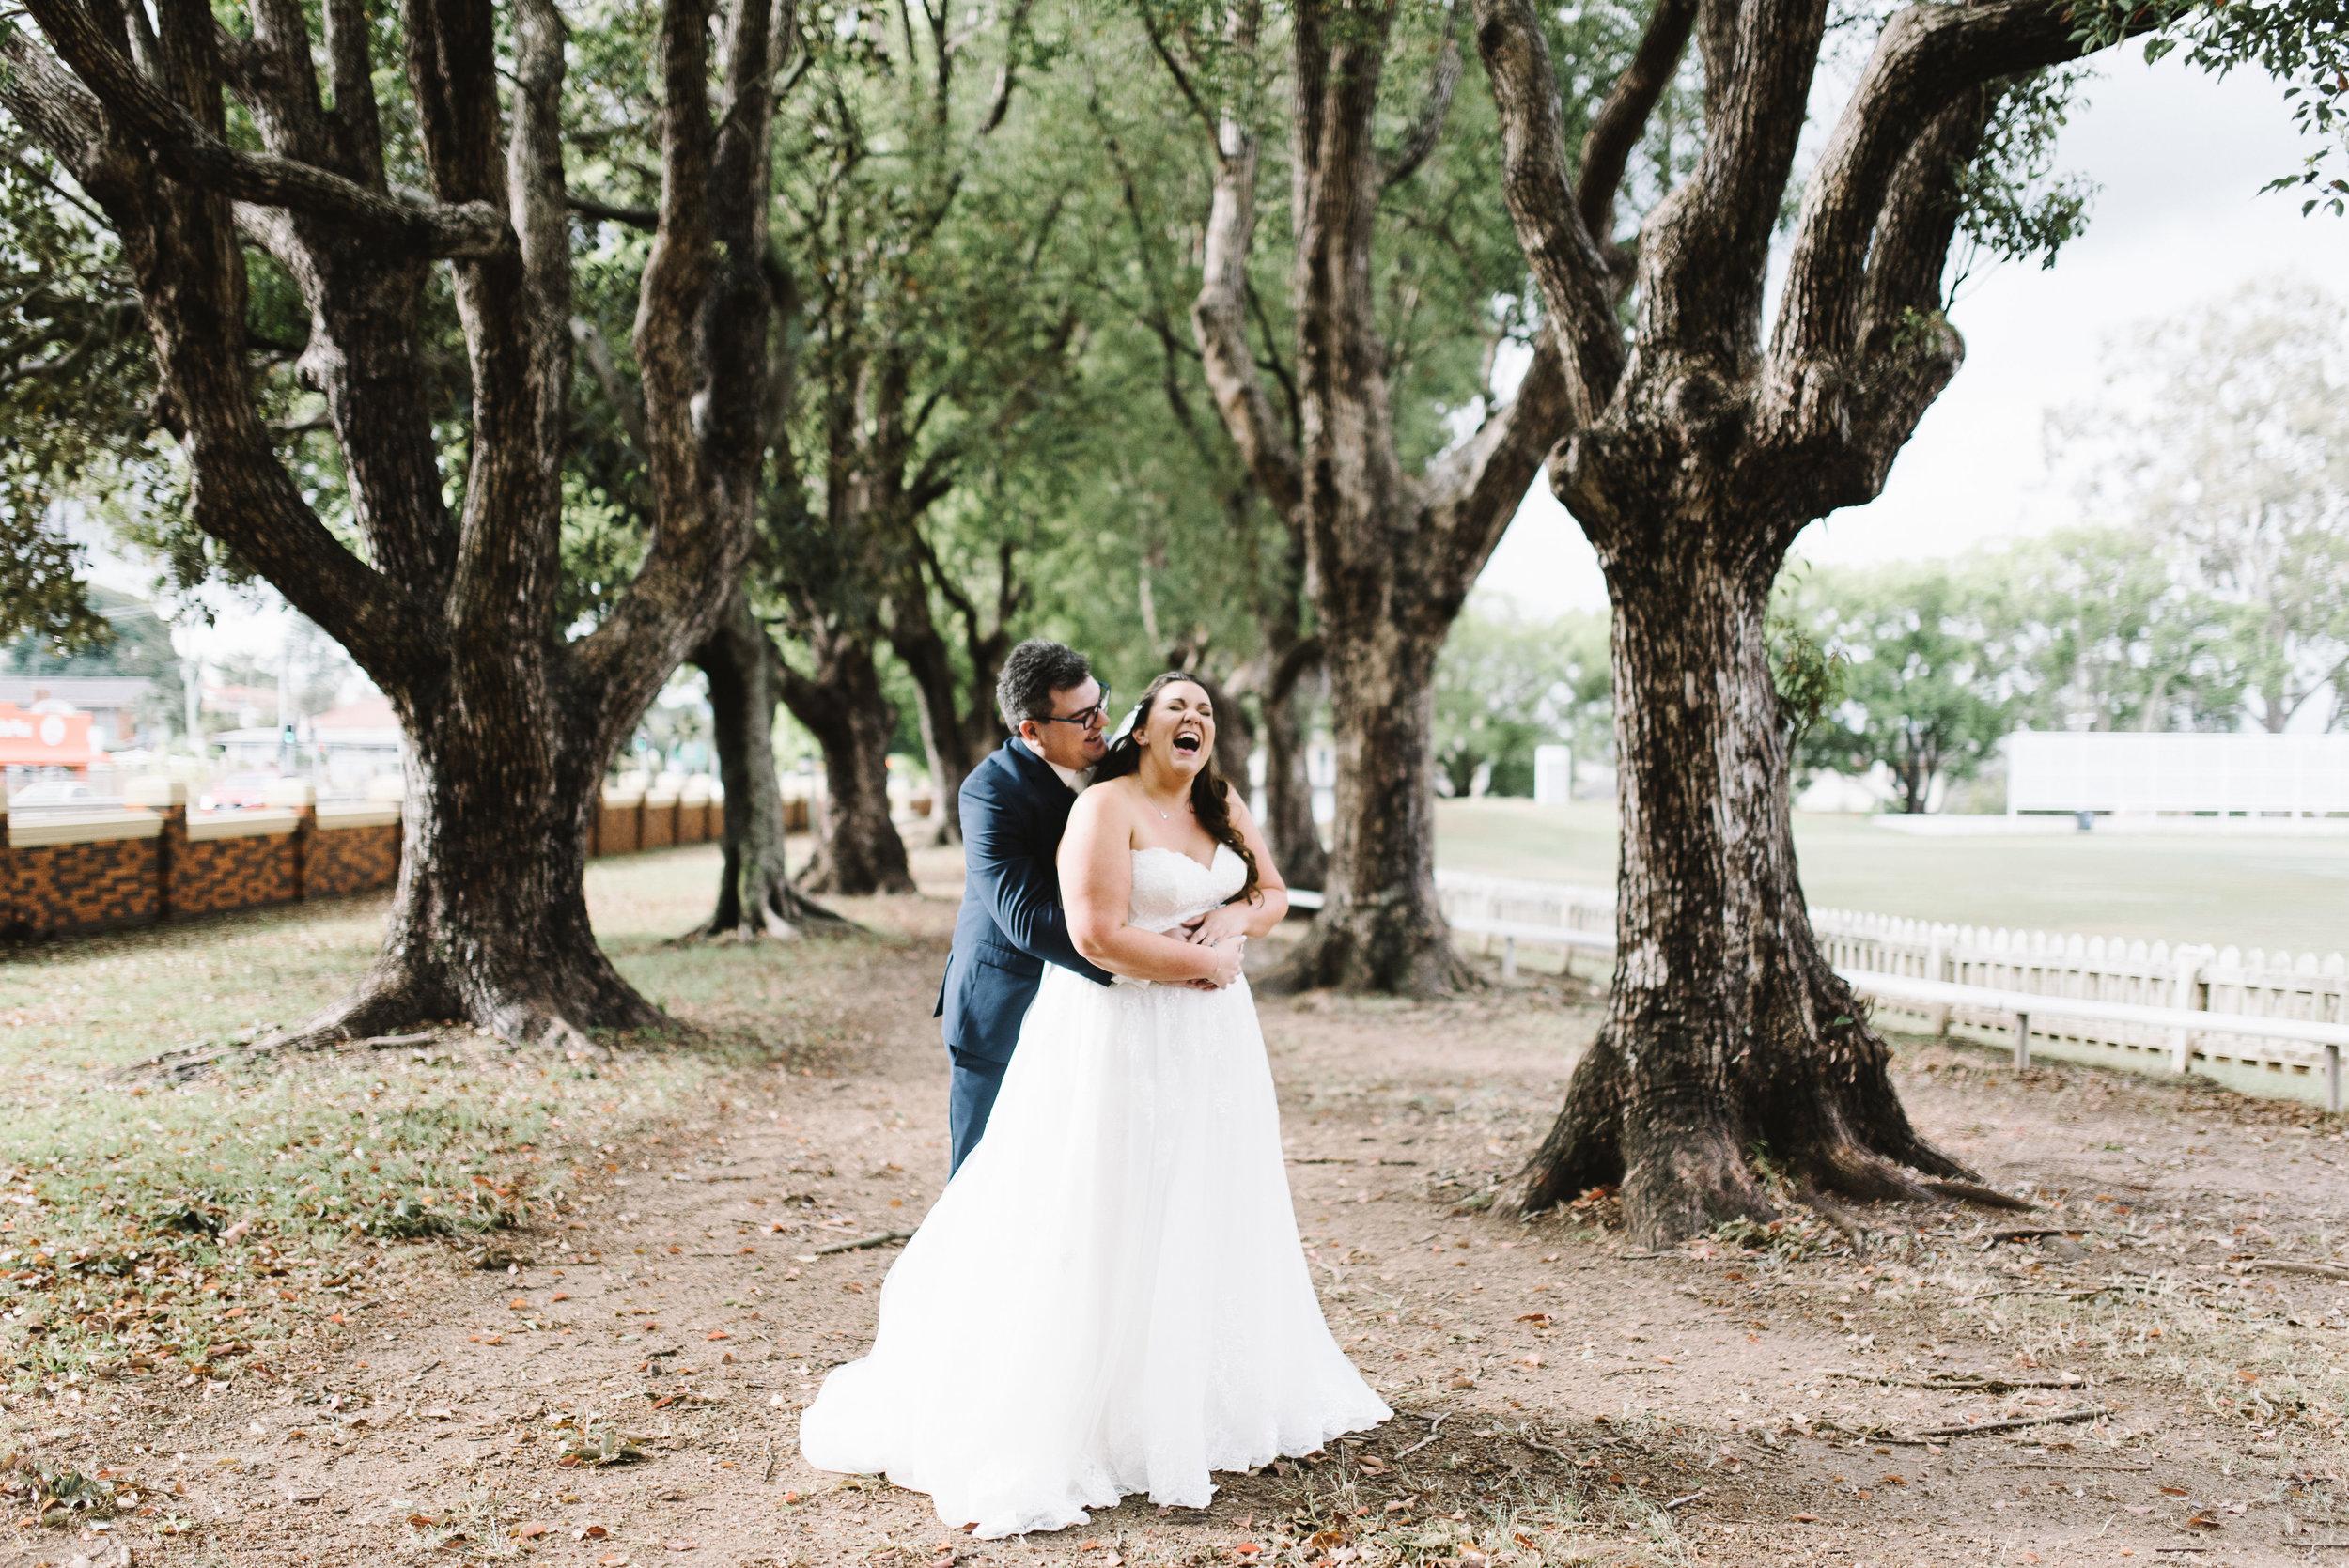 brisbane-wedding-photographer-65.jpg